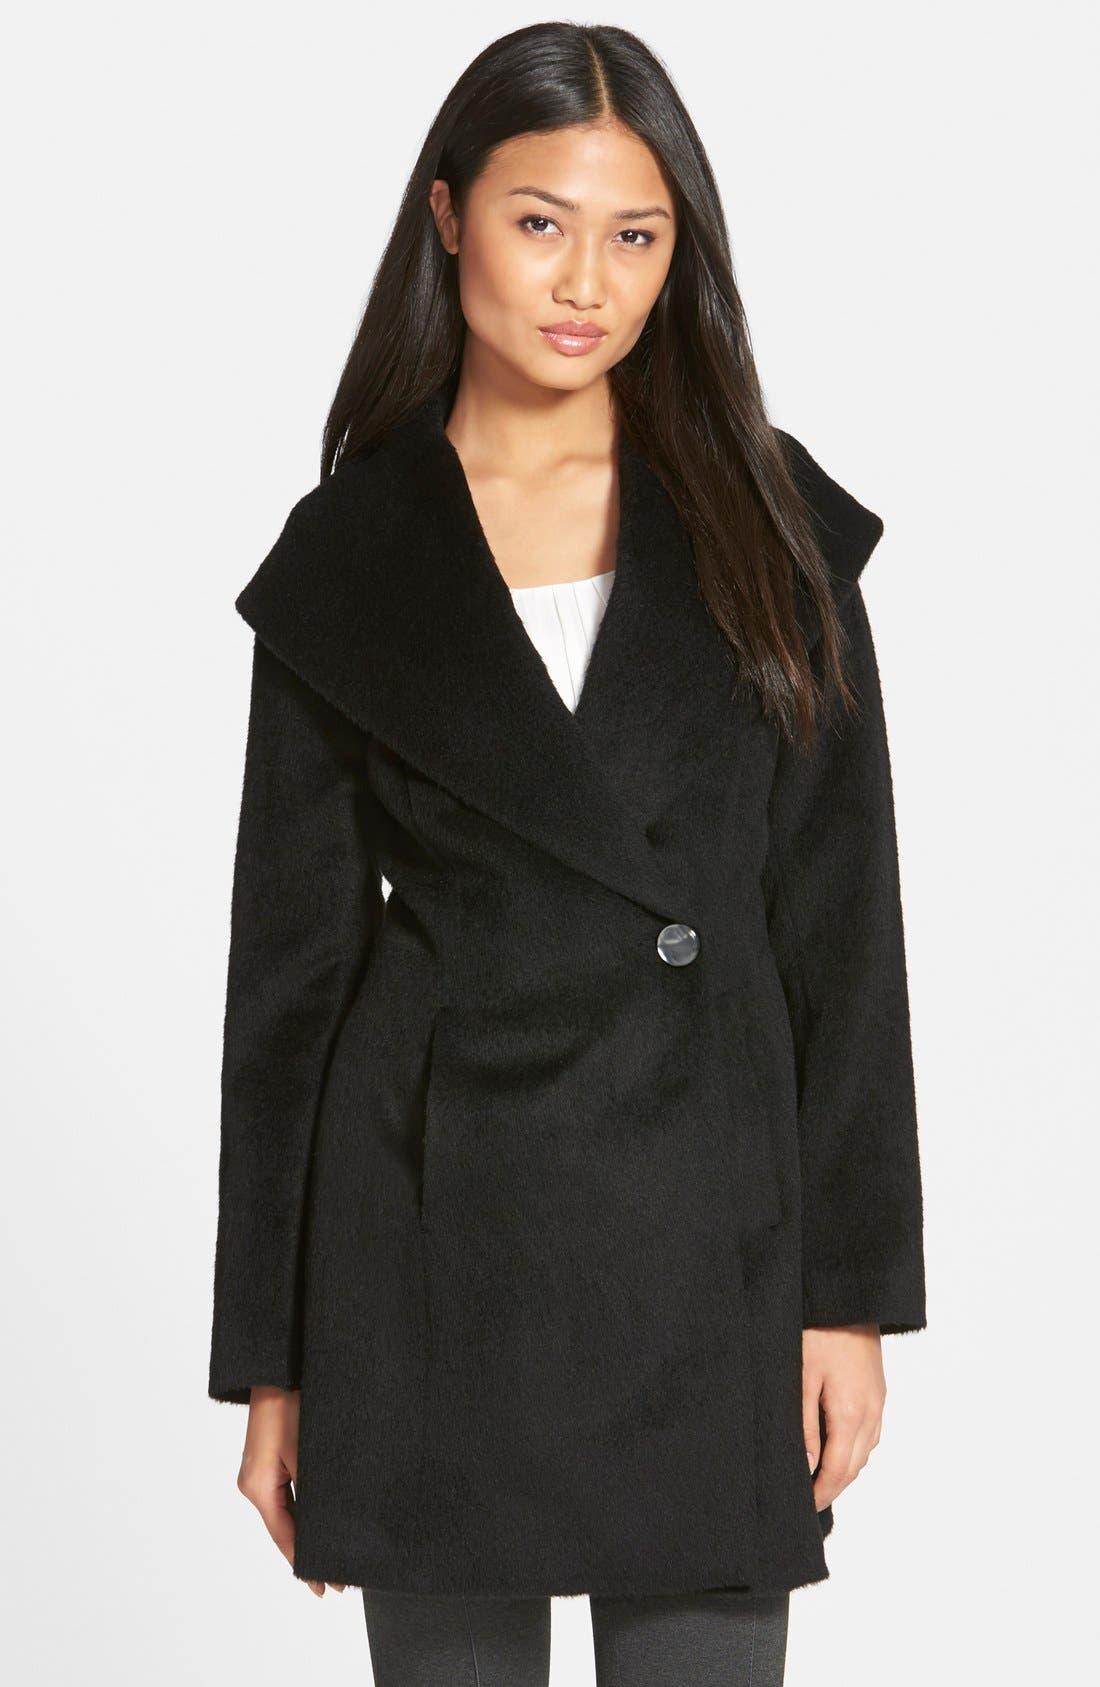 TRINA TURK 'Bonnie' Shawl Collar Skirted Coat, Main, color, 001